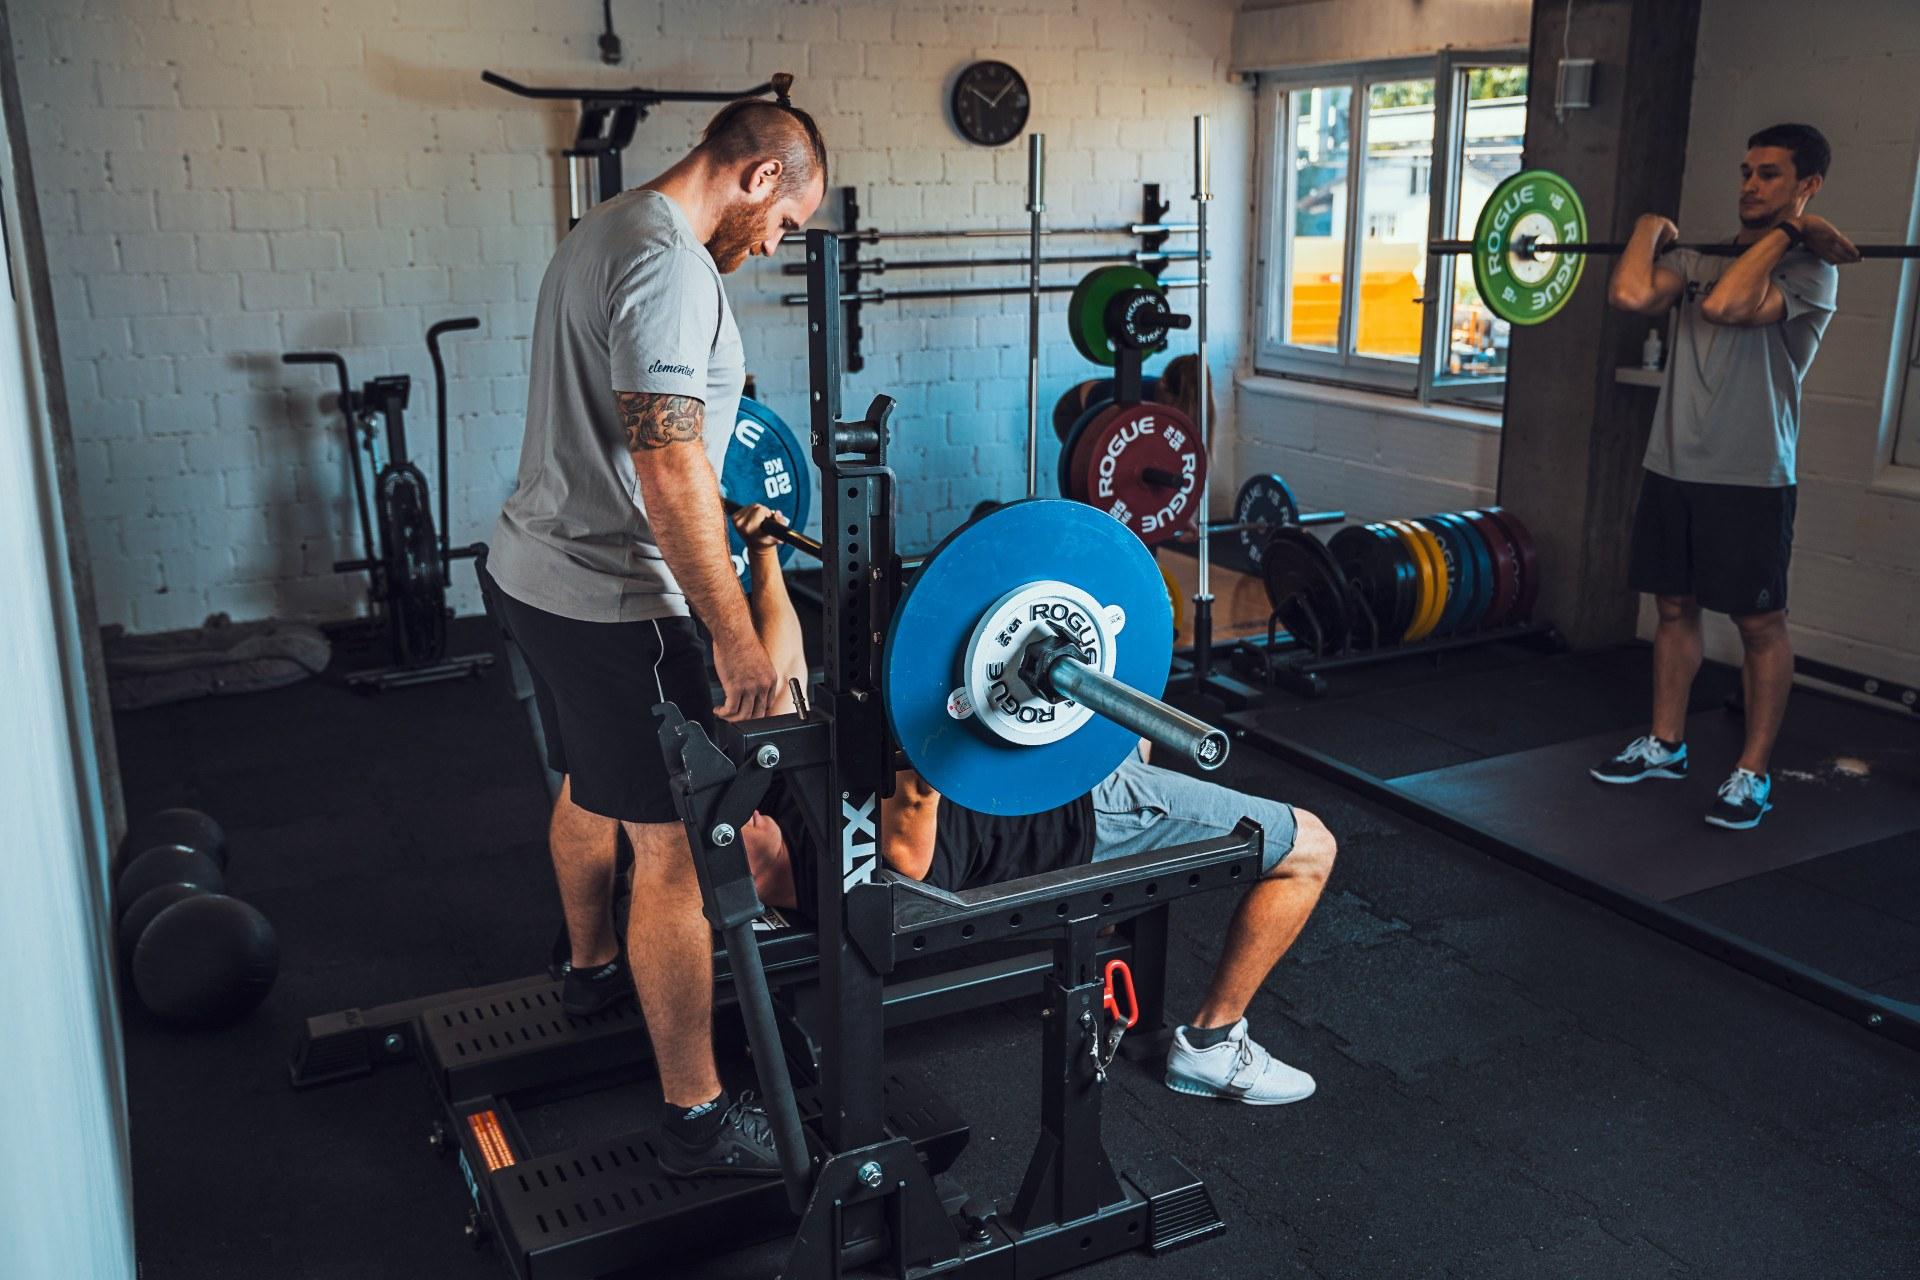 Benchpressing - Elemental Training